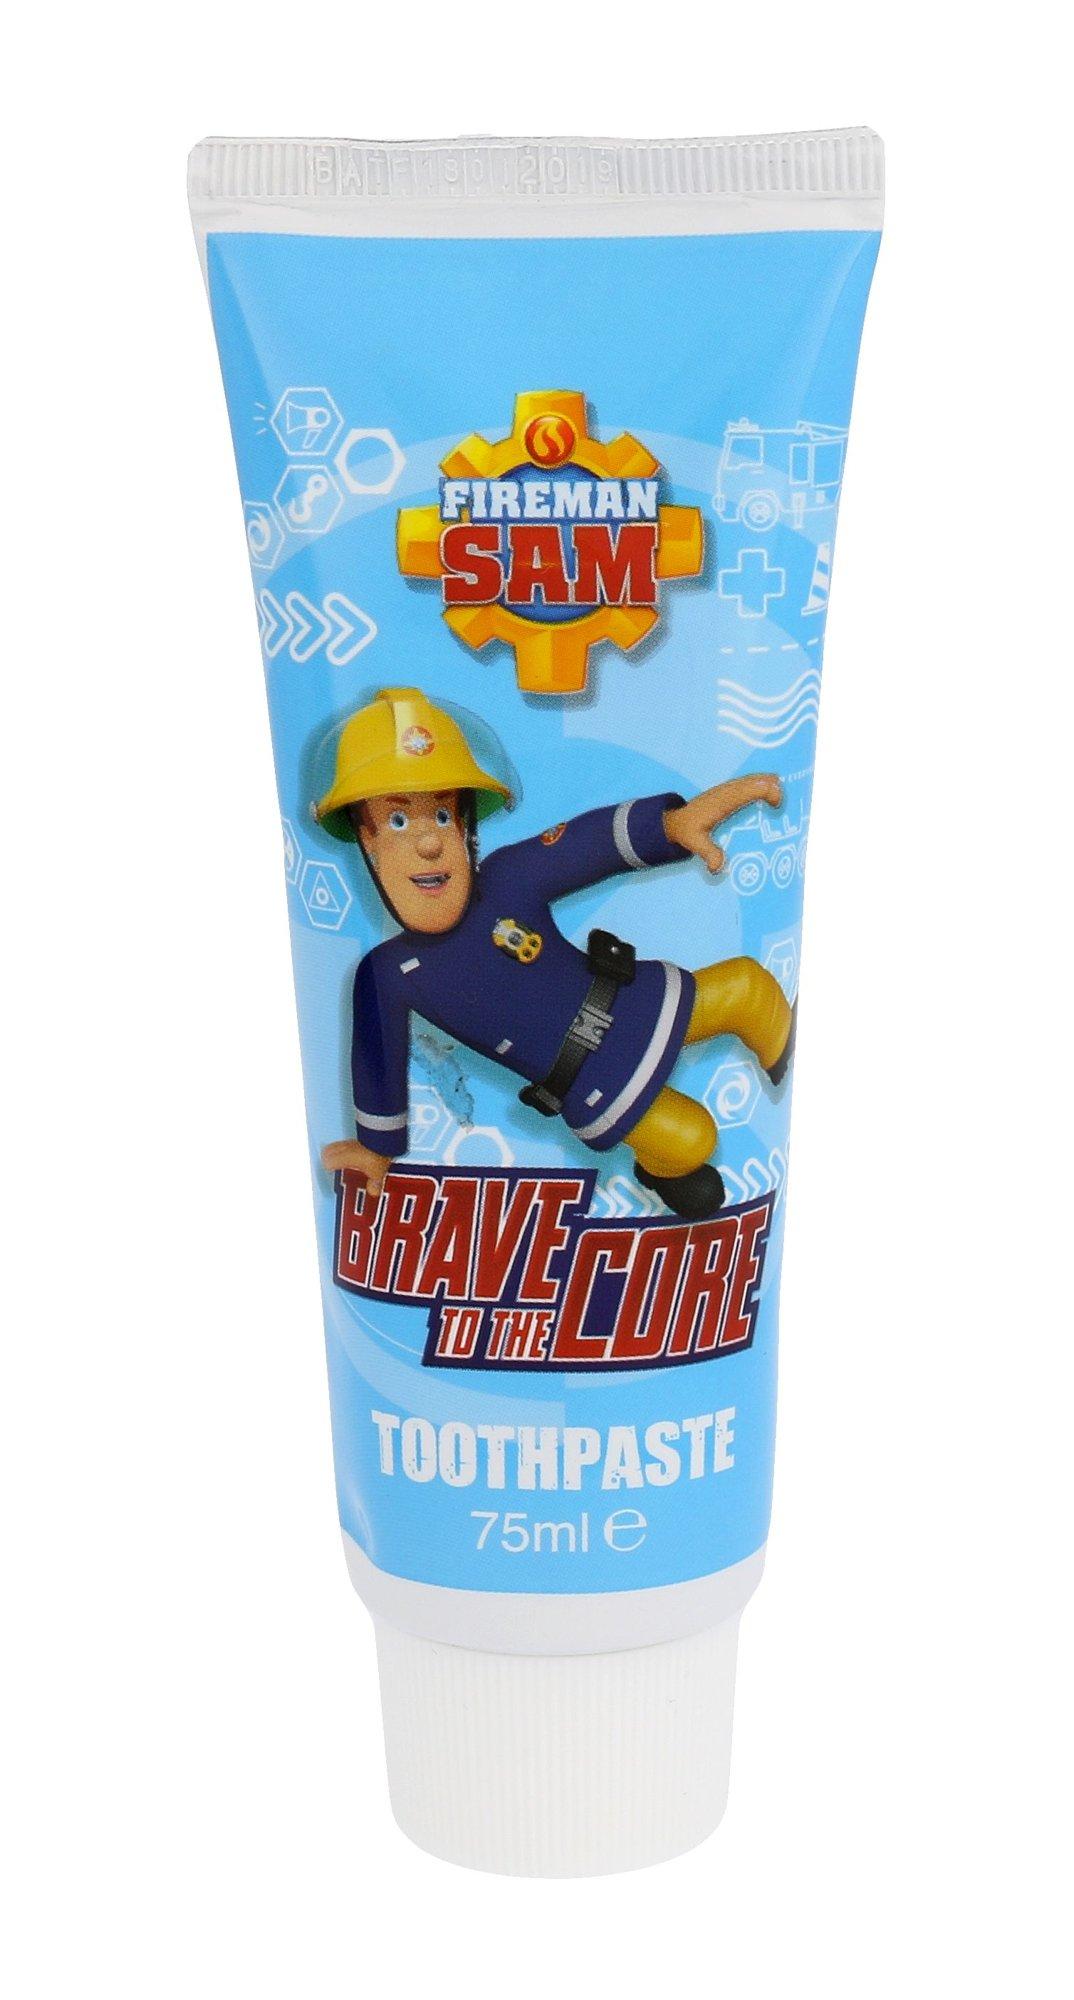 Fireman Sam Sam Toothpaste Cosmetic 75ml